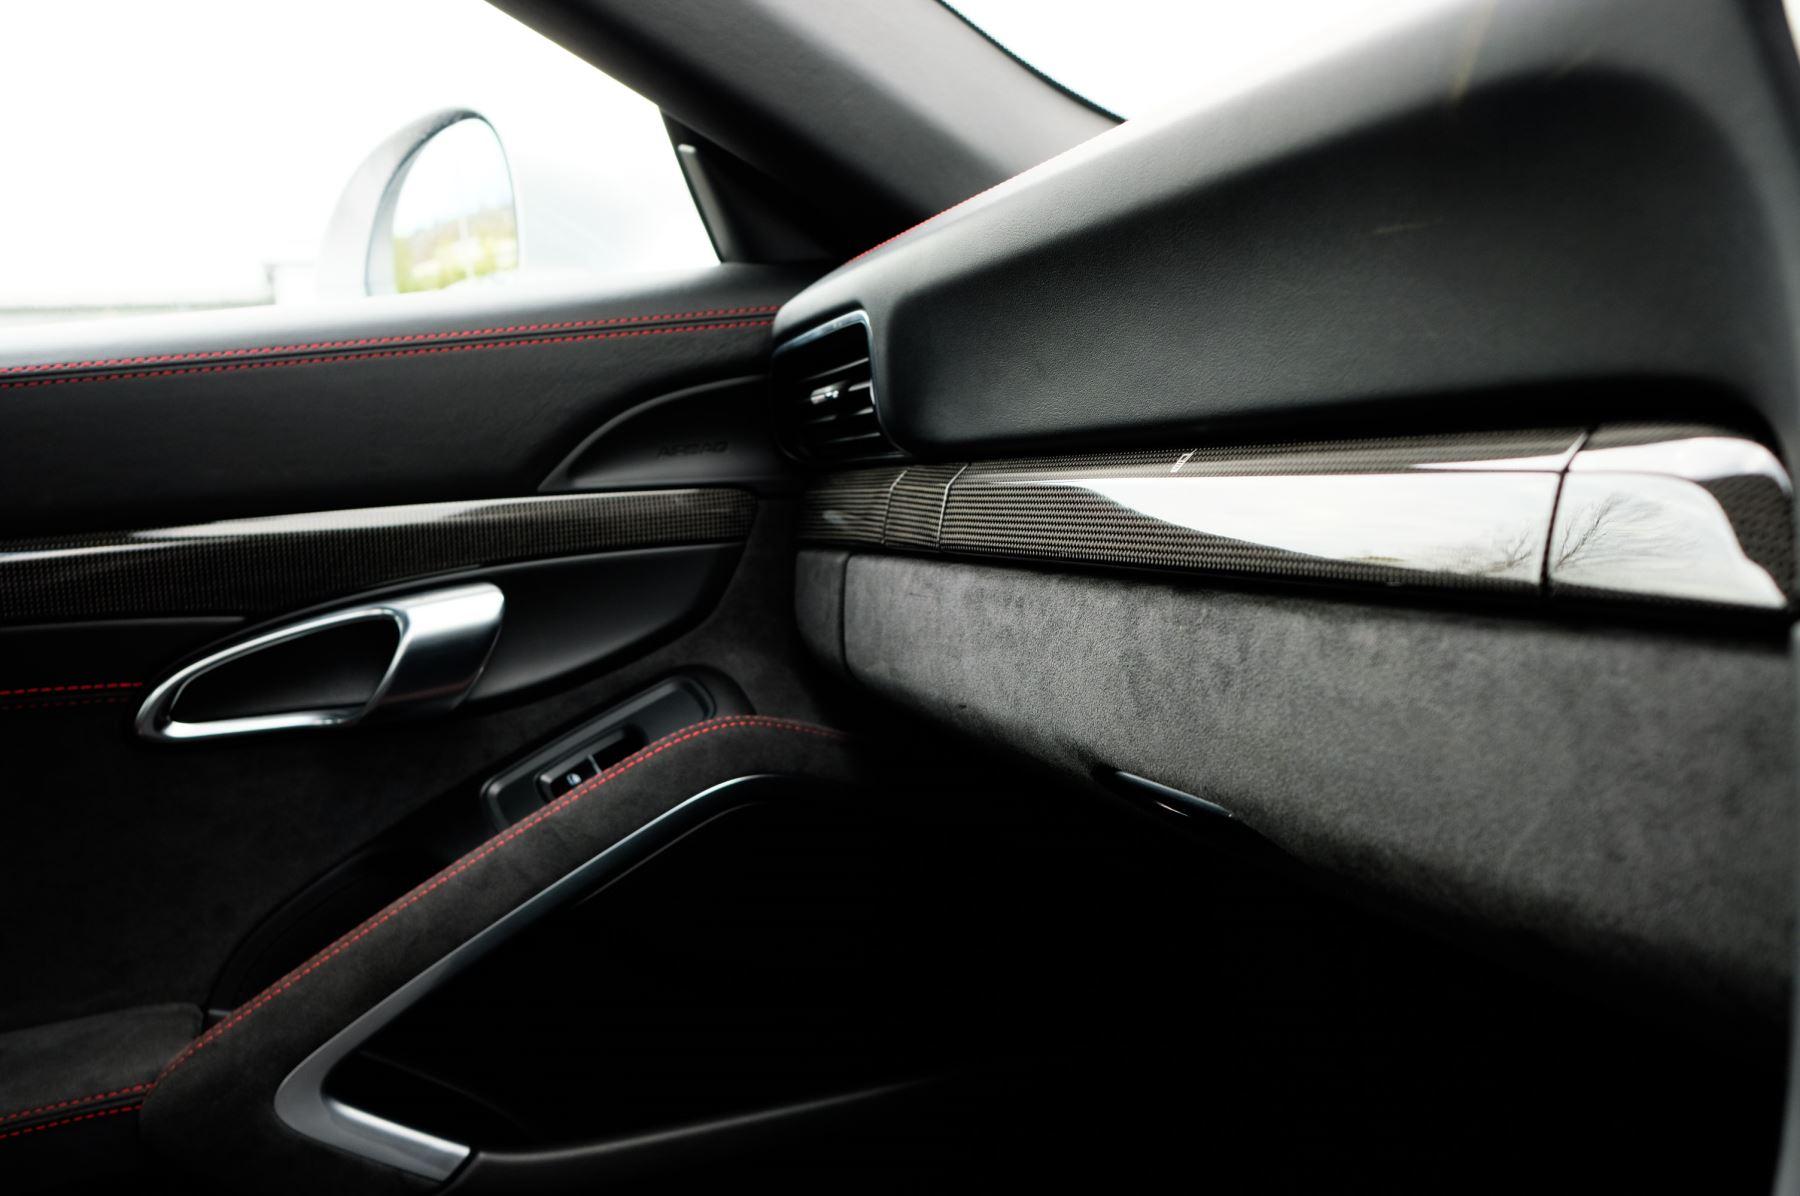 Porsche 911 TARGA 4 GTS - PDK - SPORT DESIGN PACKAGE - GTS INTERIOR PACKAGE image 34